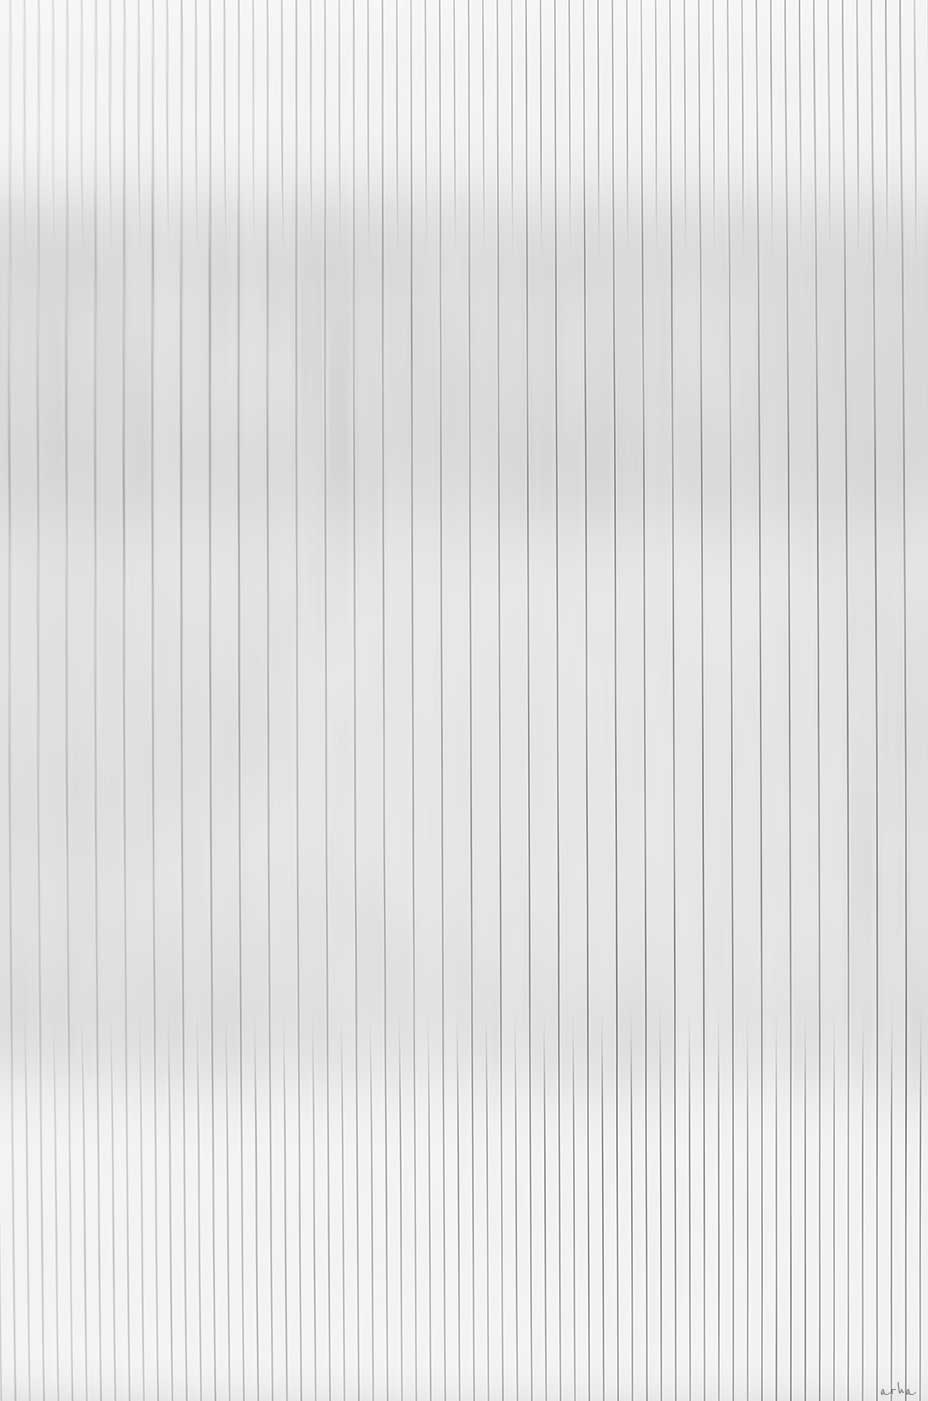 Intelligence-Matter-minimalism-copyright-2012-arha-Tomomichi-Morifuji